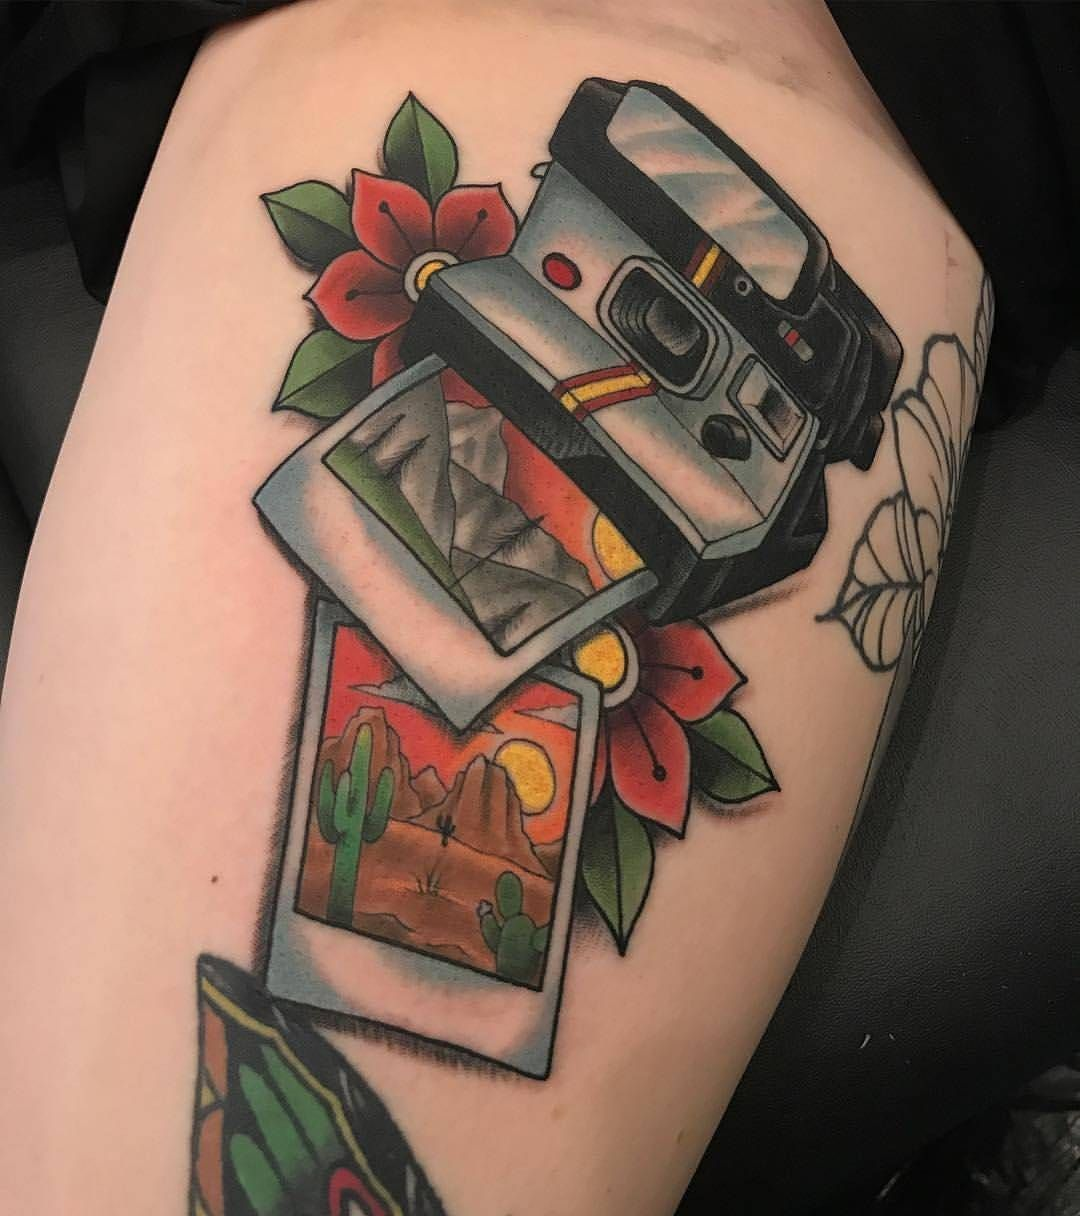 Tattoosnob Tattoosnob On Instagram Scenic Polaroid By Mike Stoll In Toledo Ohio Photos Photographs Polaroi With Images Camera Tattoos Traditional Tattoo Tattoos